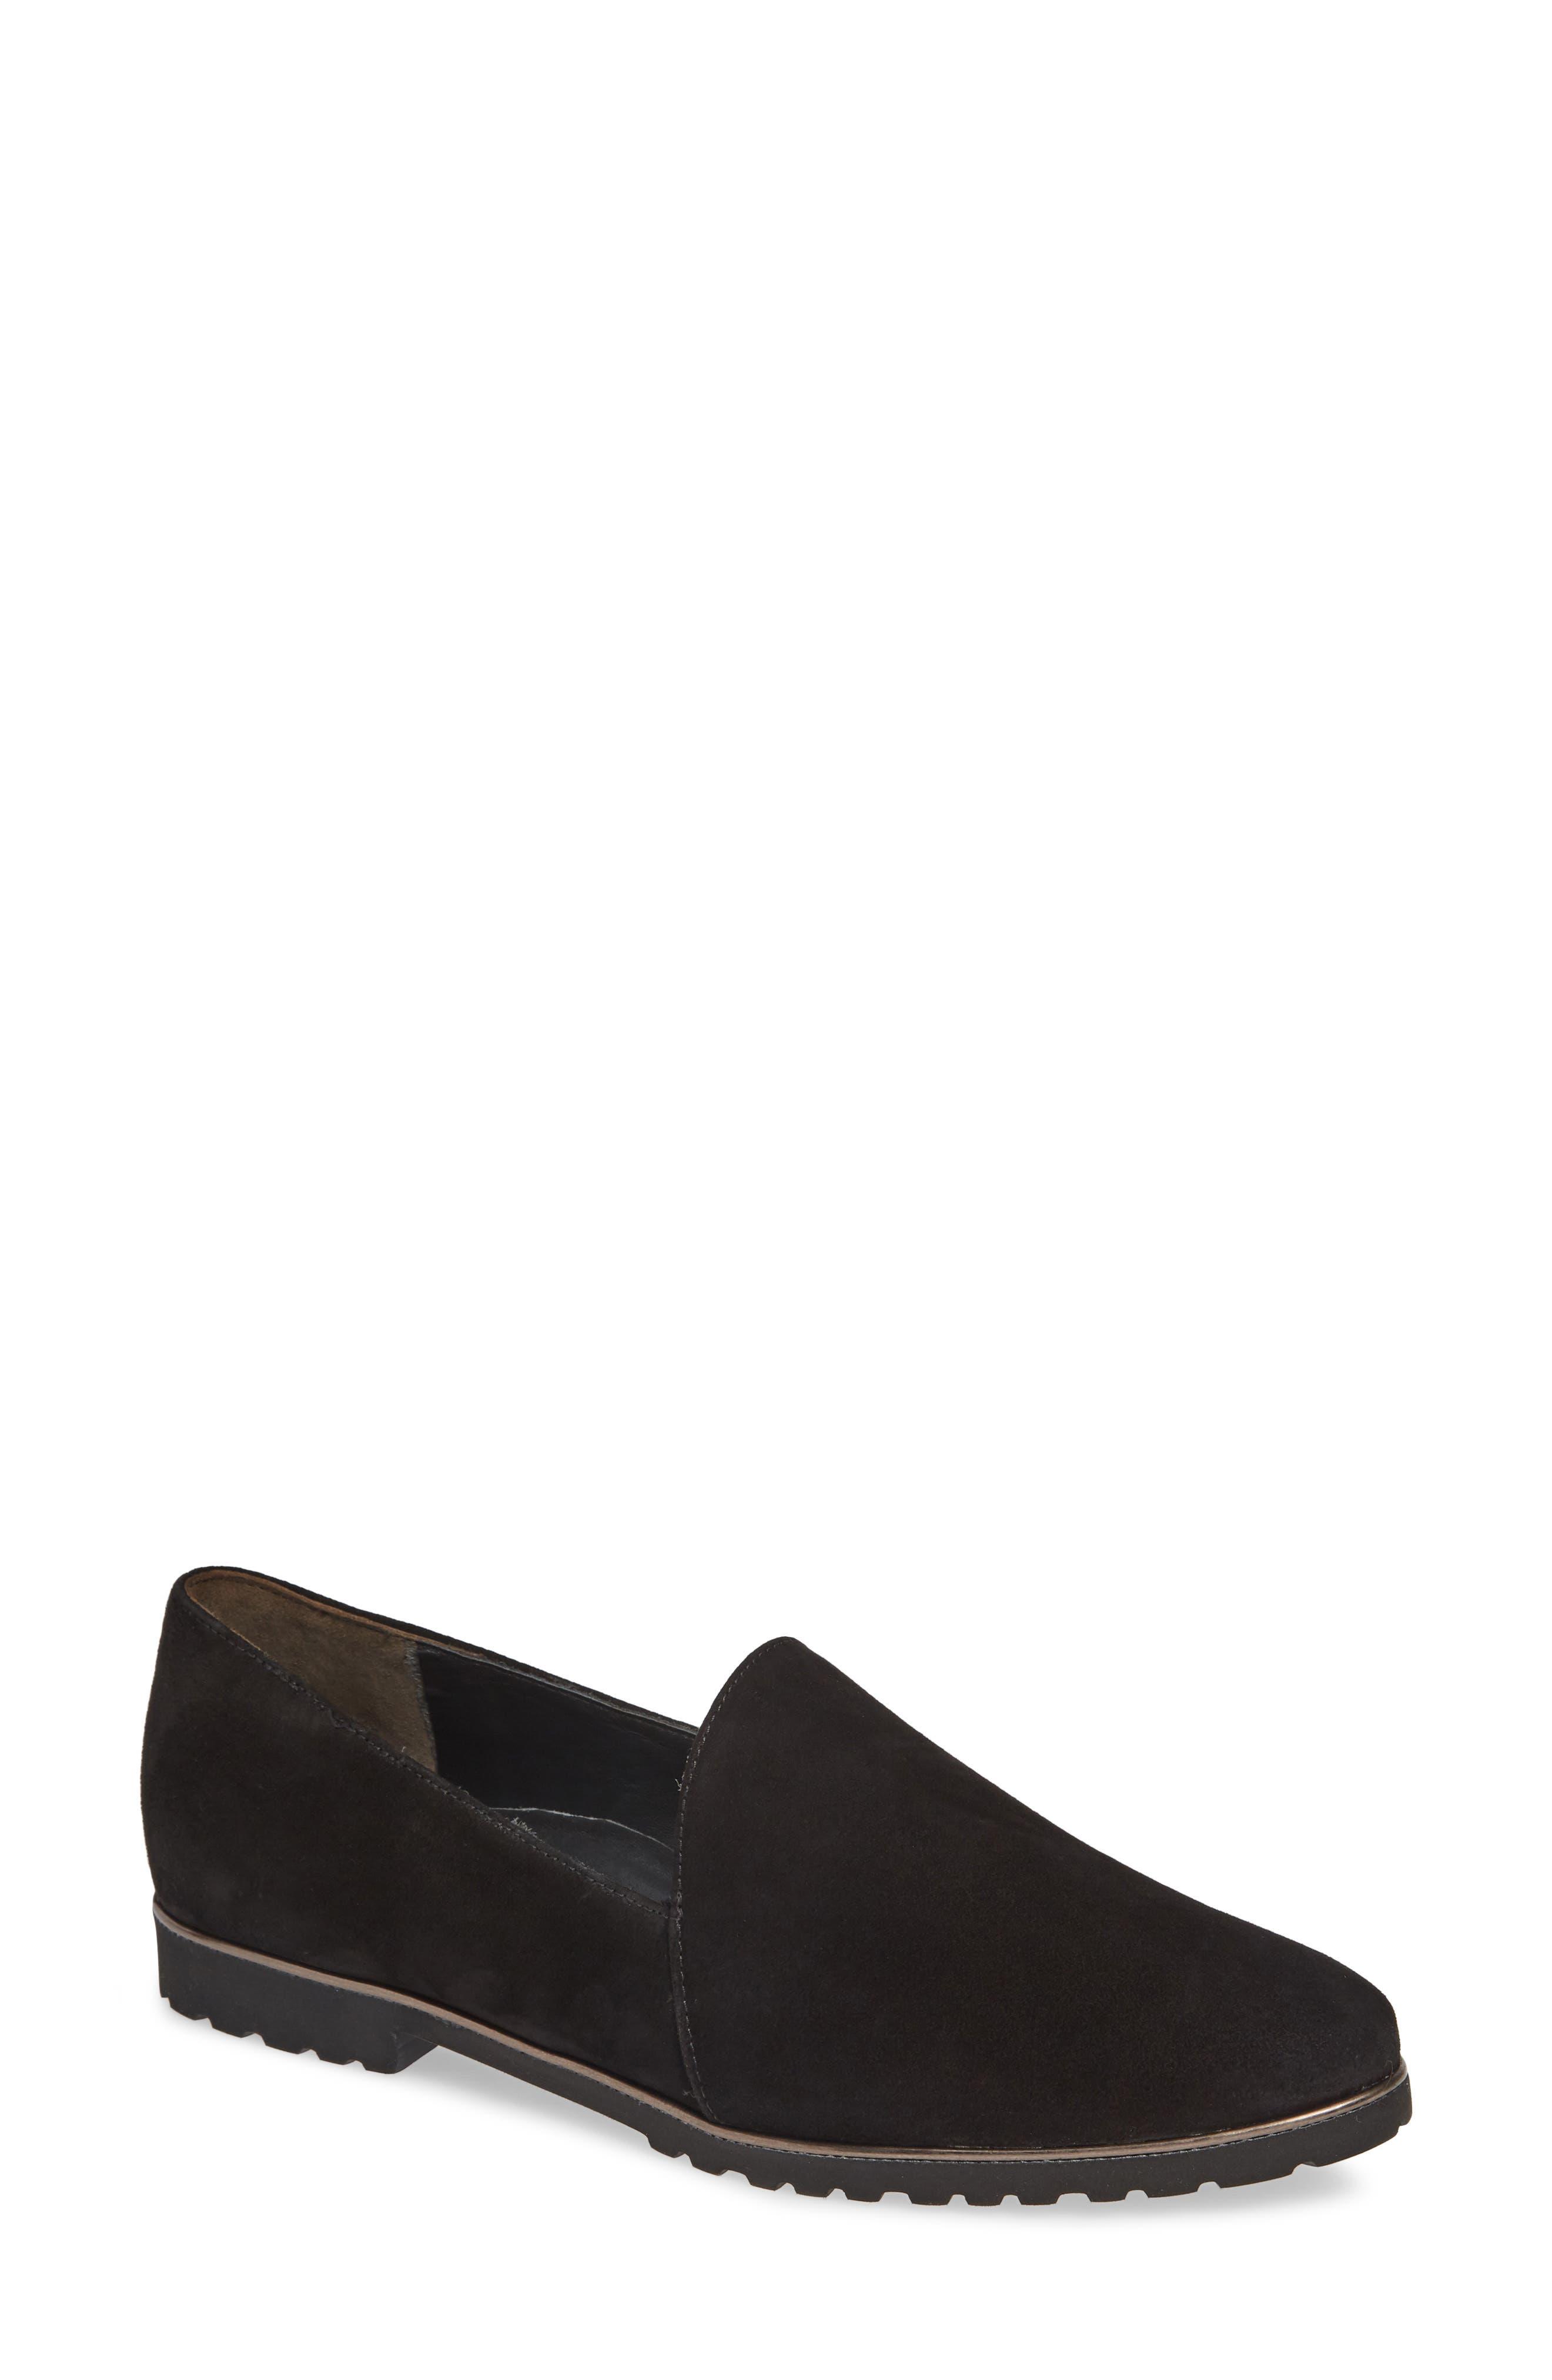 Paul Green Uptown Loafer, US/ 5.5UK - Black